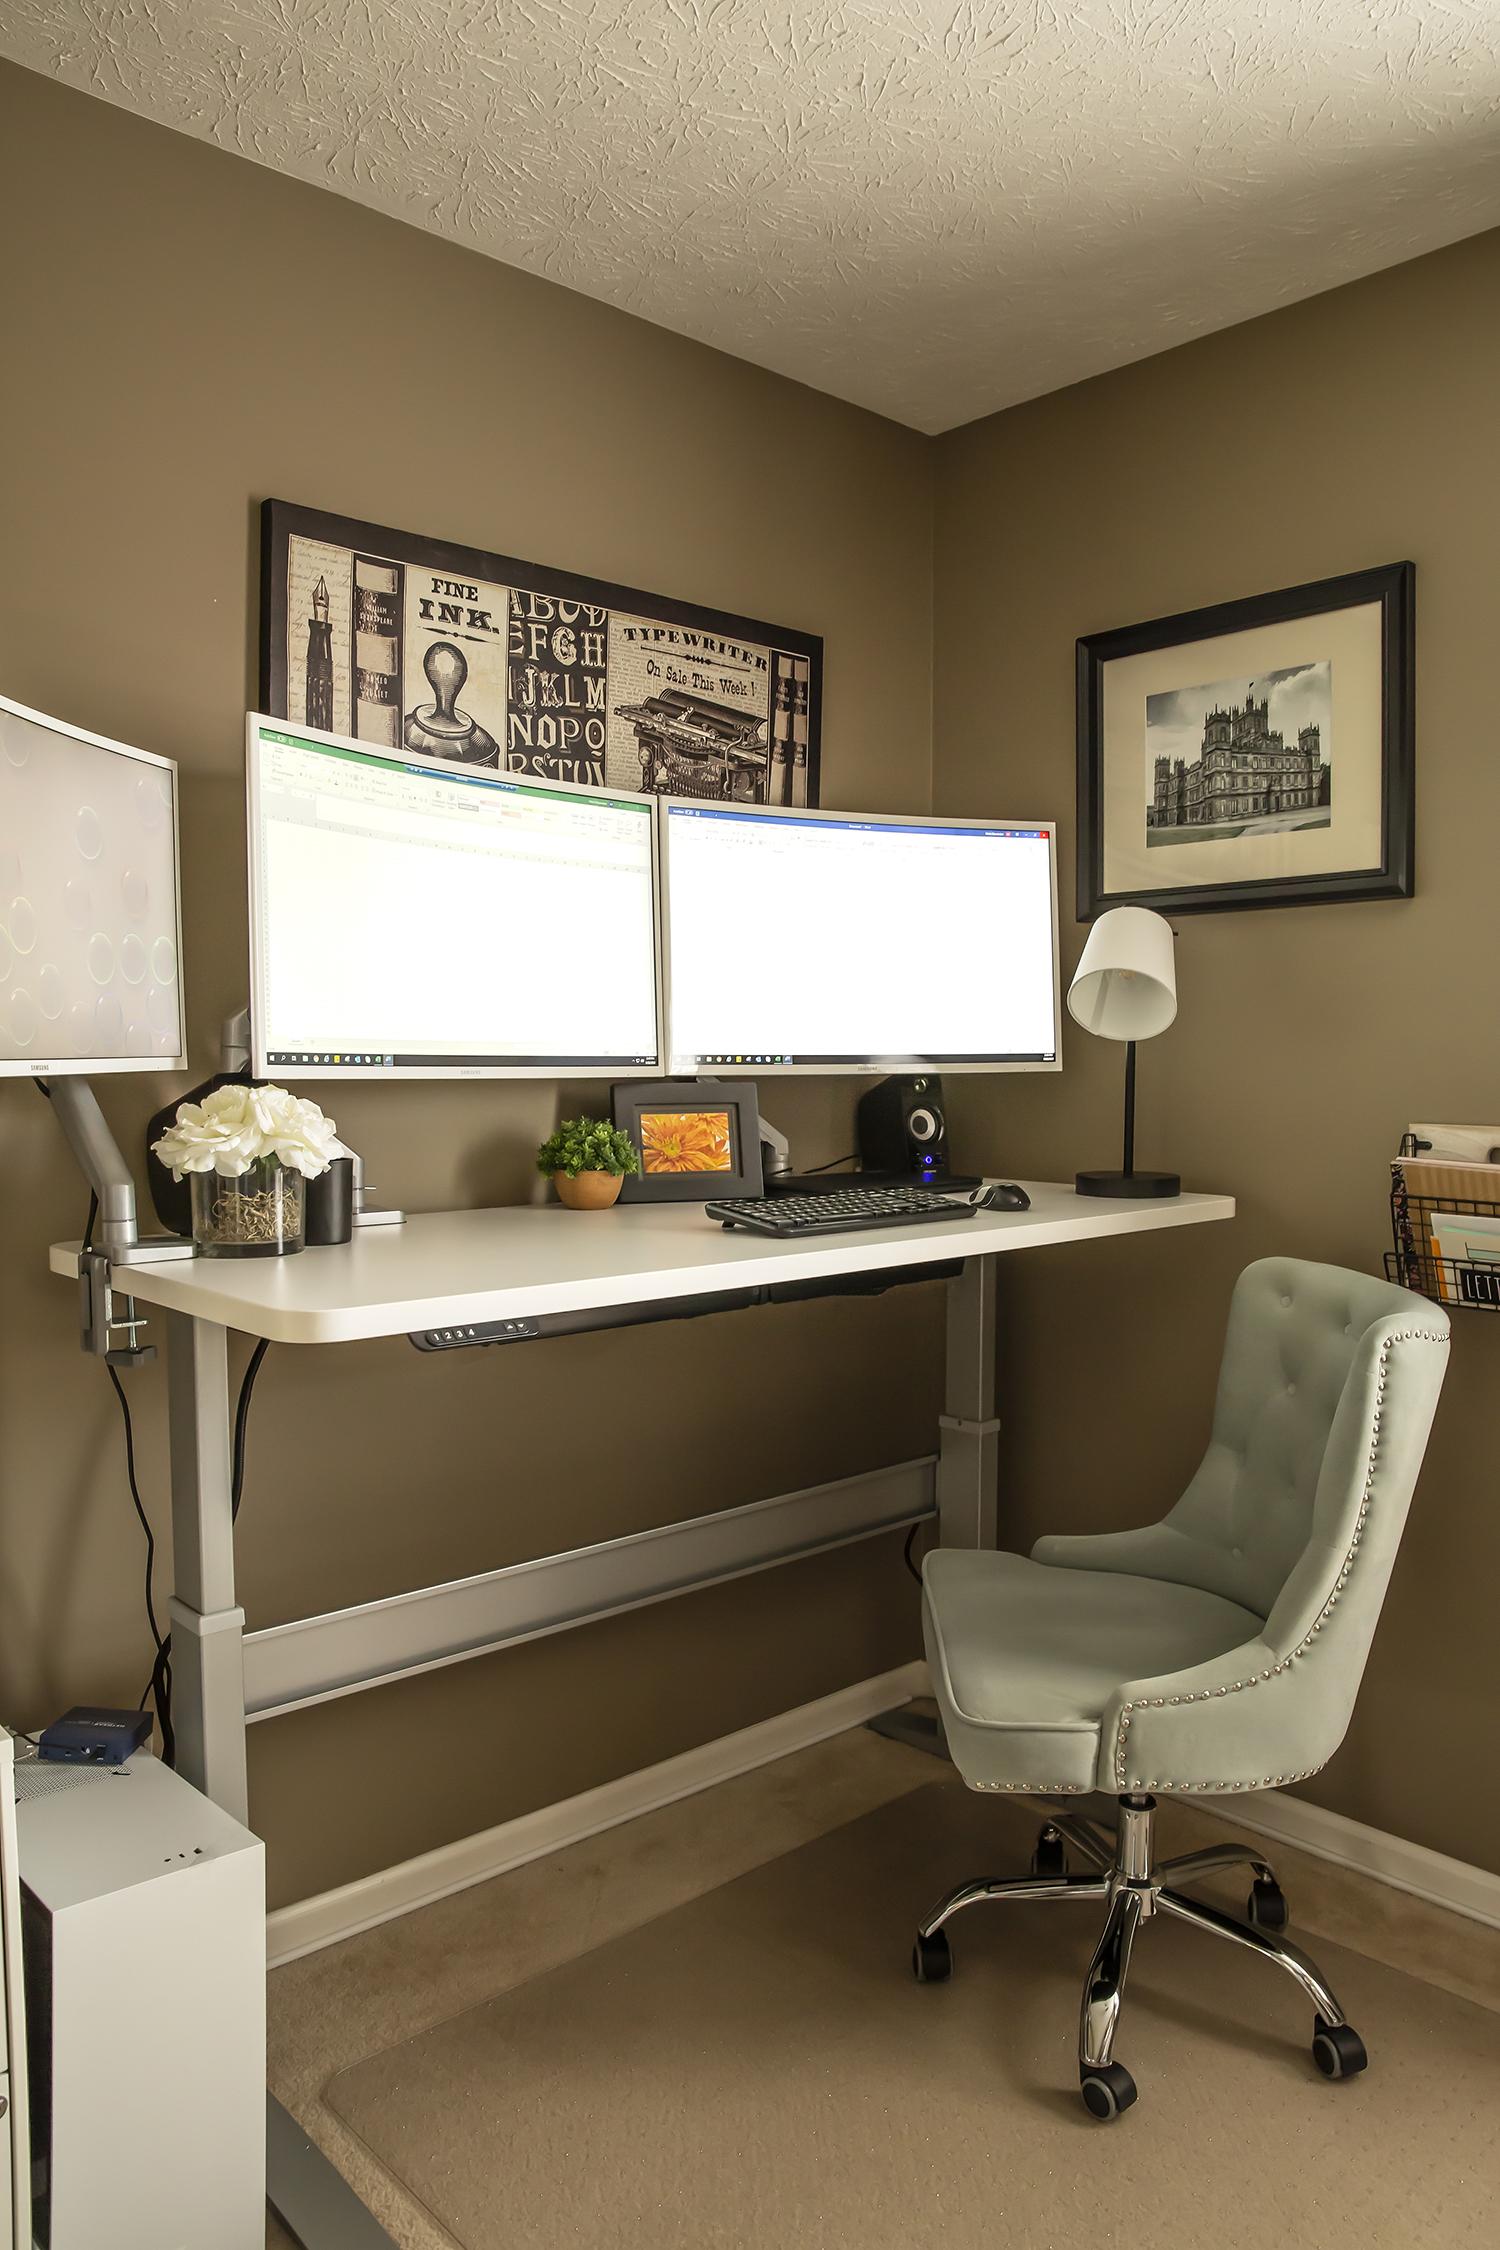 "27"" x 63"" Galaxy White Laminate Top with Silver VertDesk Adjustable Desk Frame"